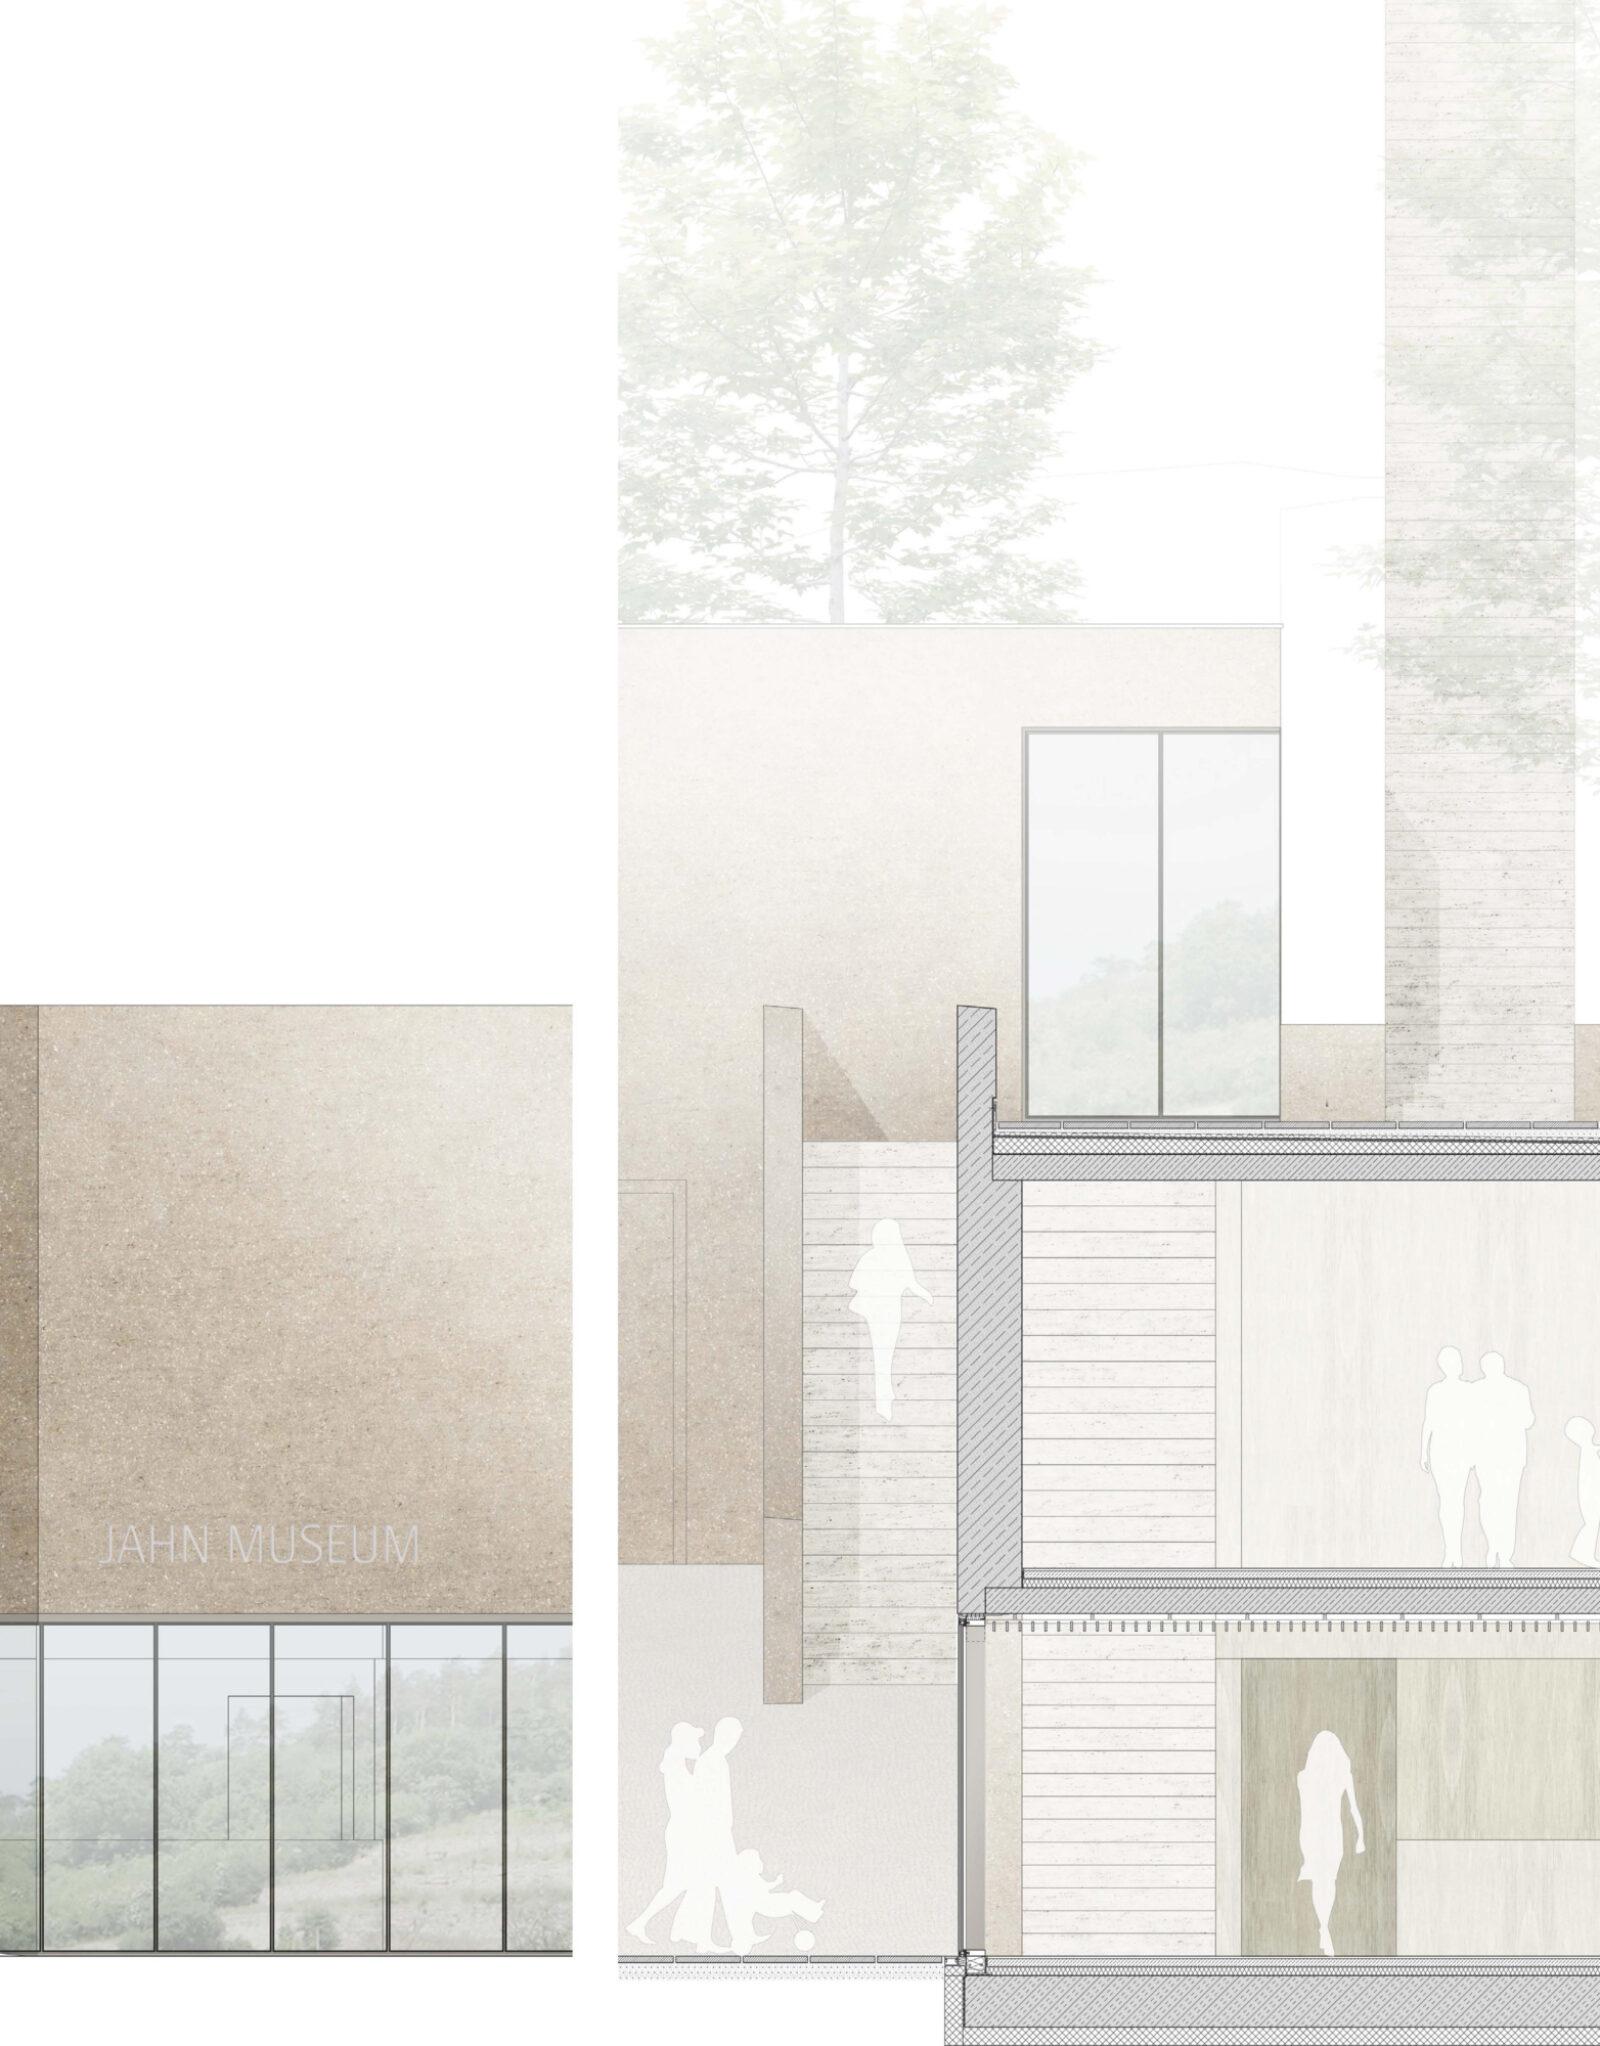 Ansicht / Schnitt Foyer + Sonderausstellung